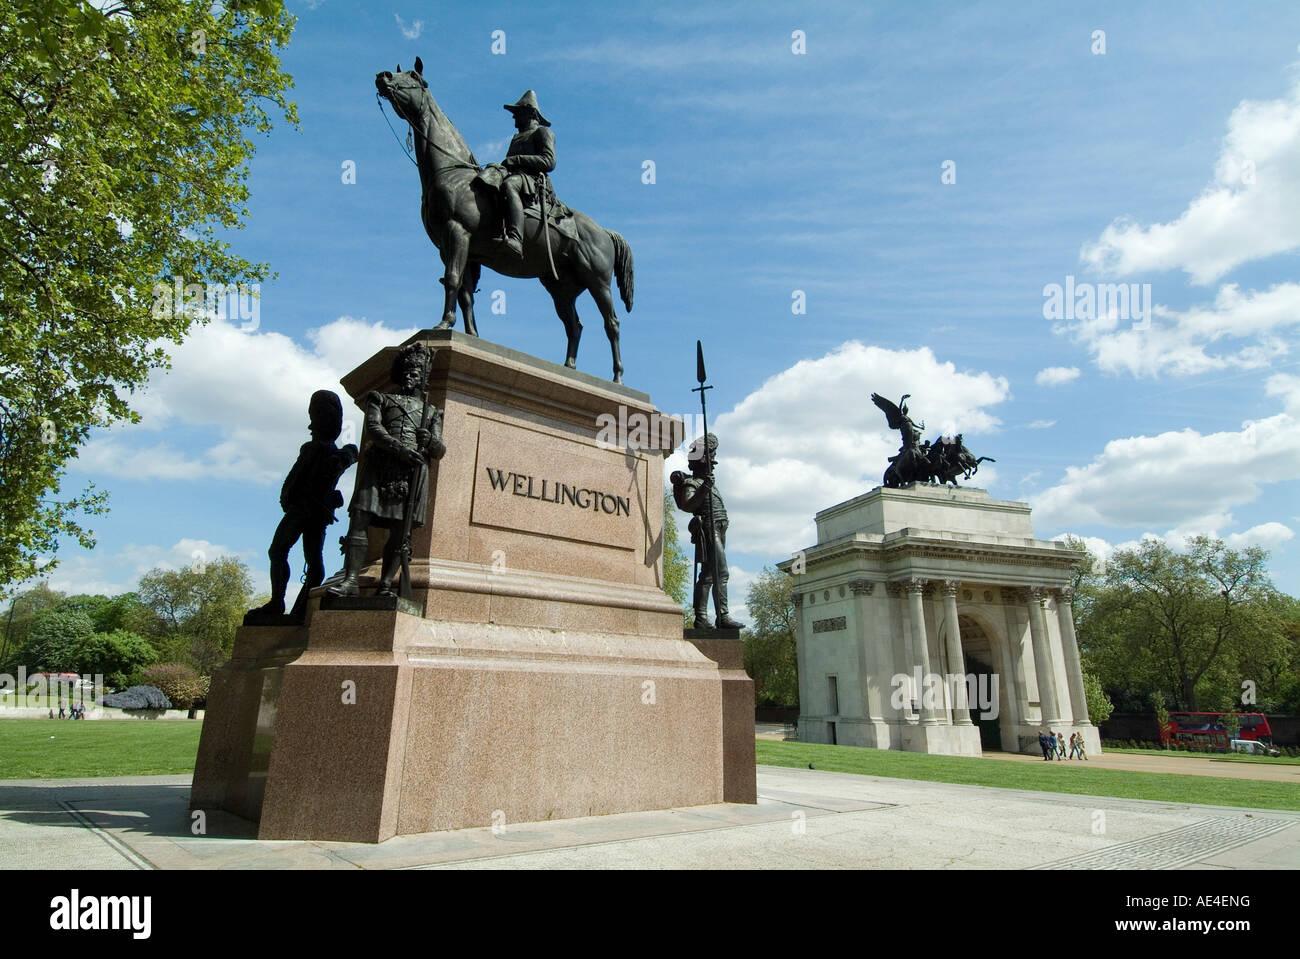 Statue of the Duke of Wellington, Hyde Park Corner, London, England, United Kingdom, Europe - Stock Image